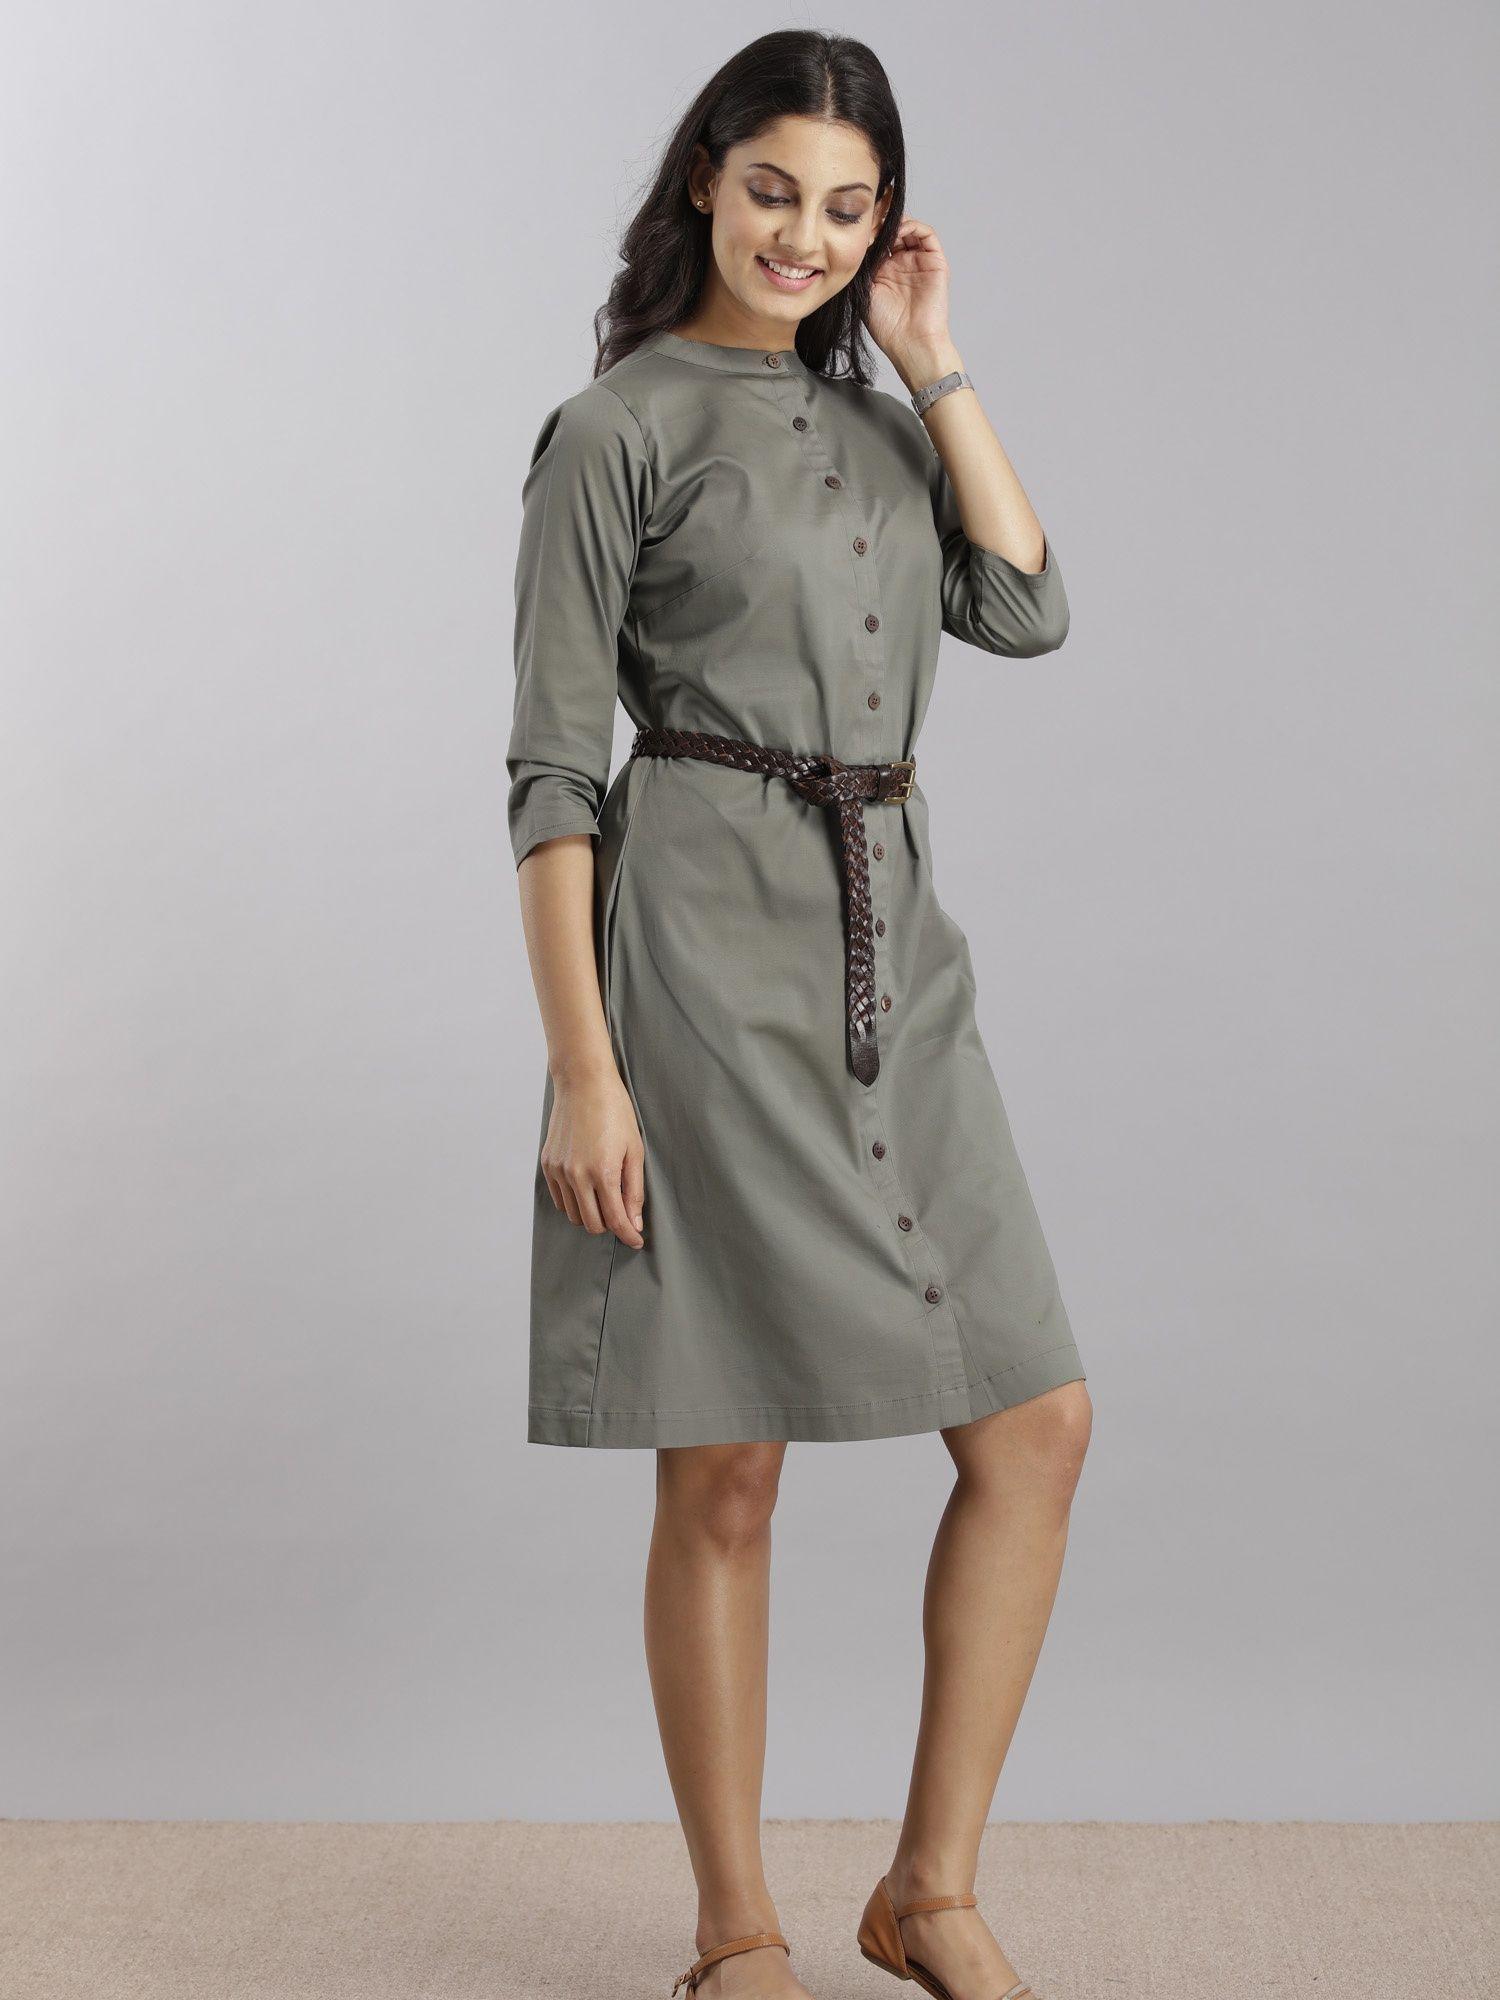 467dcee027 FableStreet Dresses   Buy FableStreet Poplin Shirt Dress - Olive ...